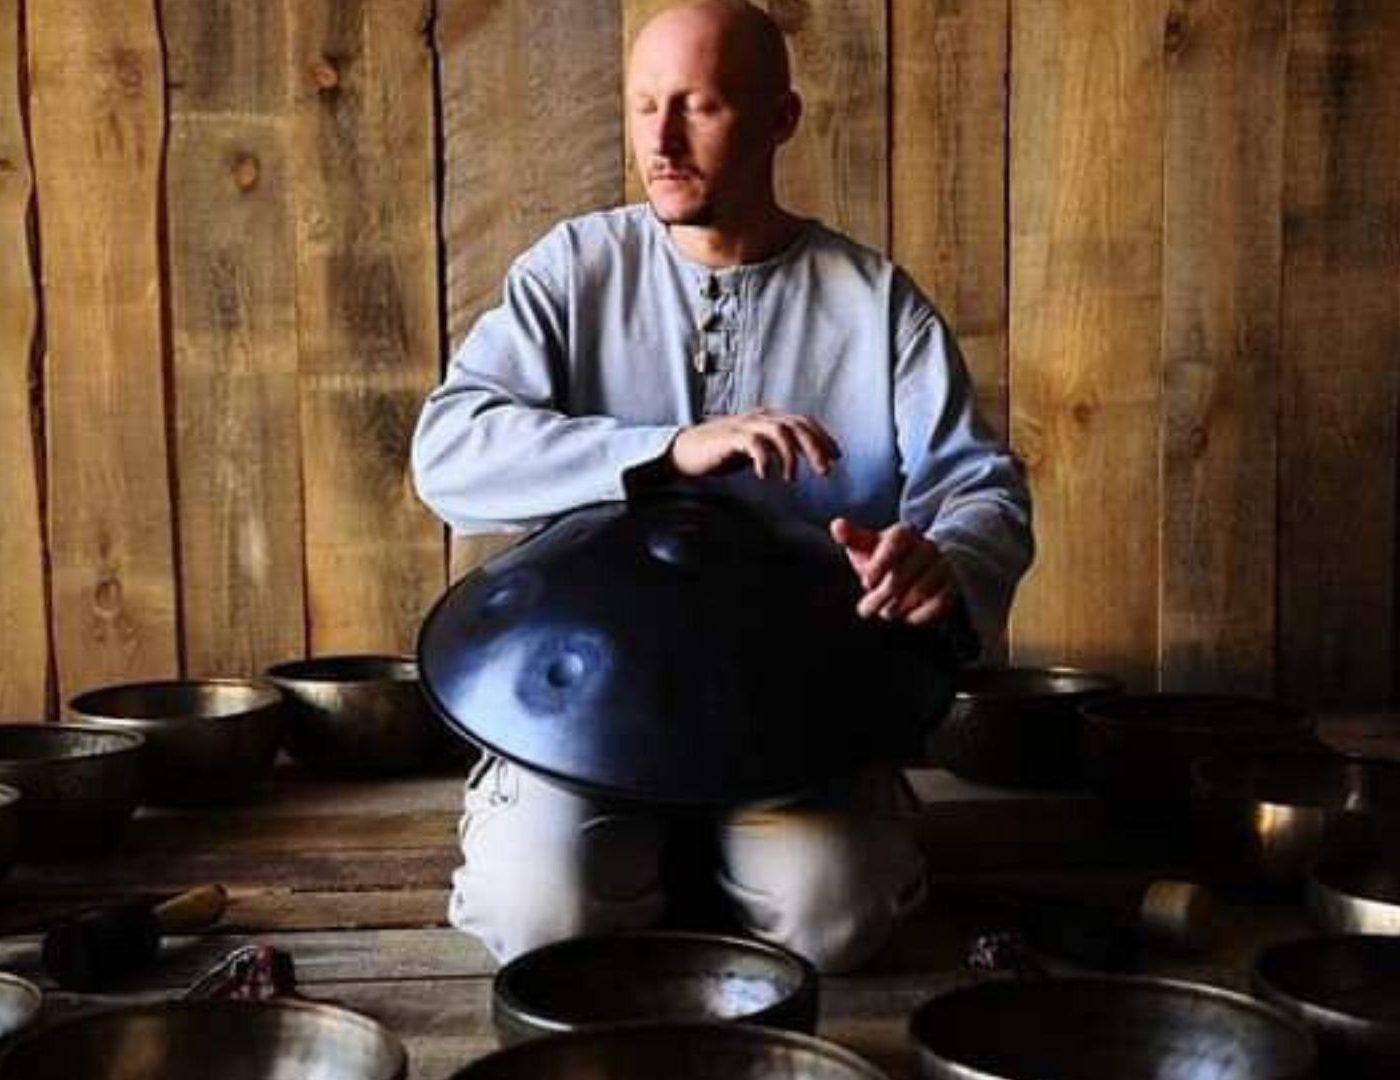 Звуковая медитация